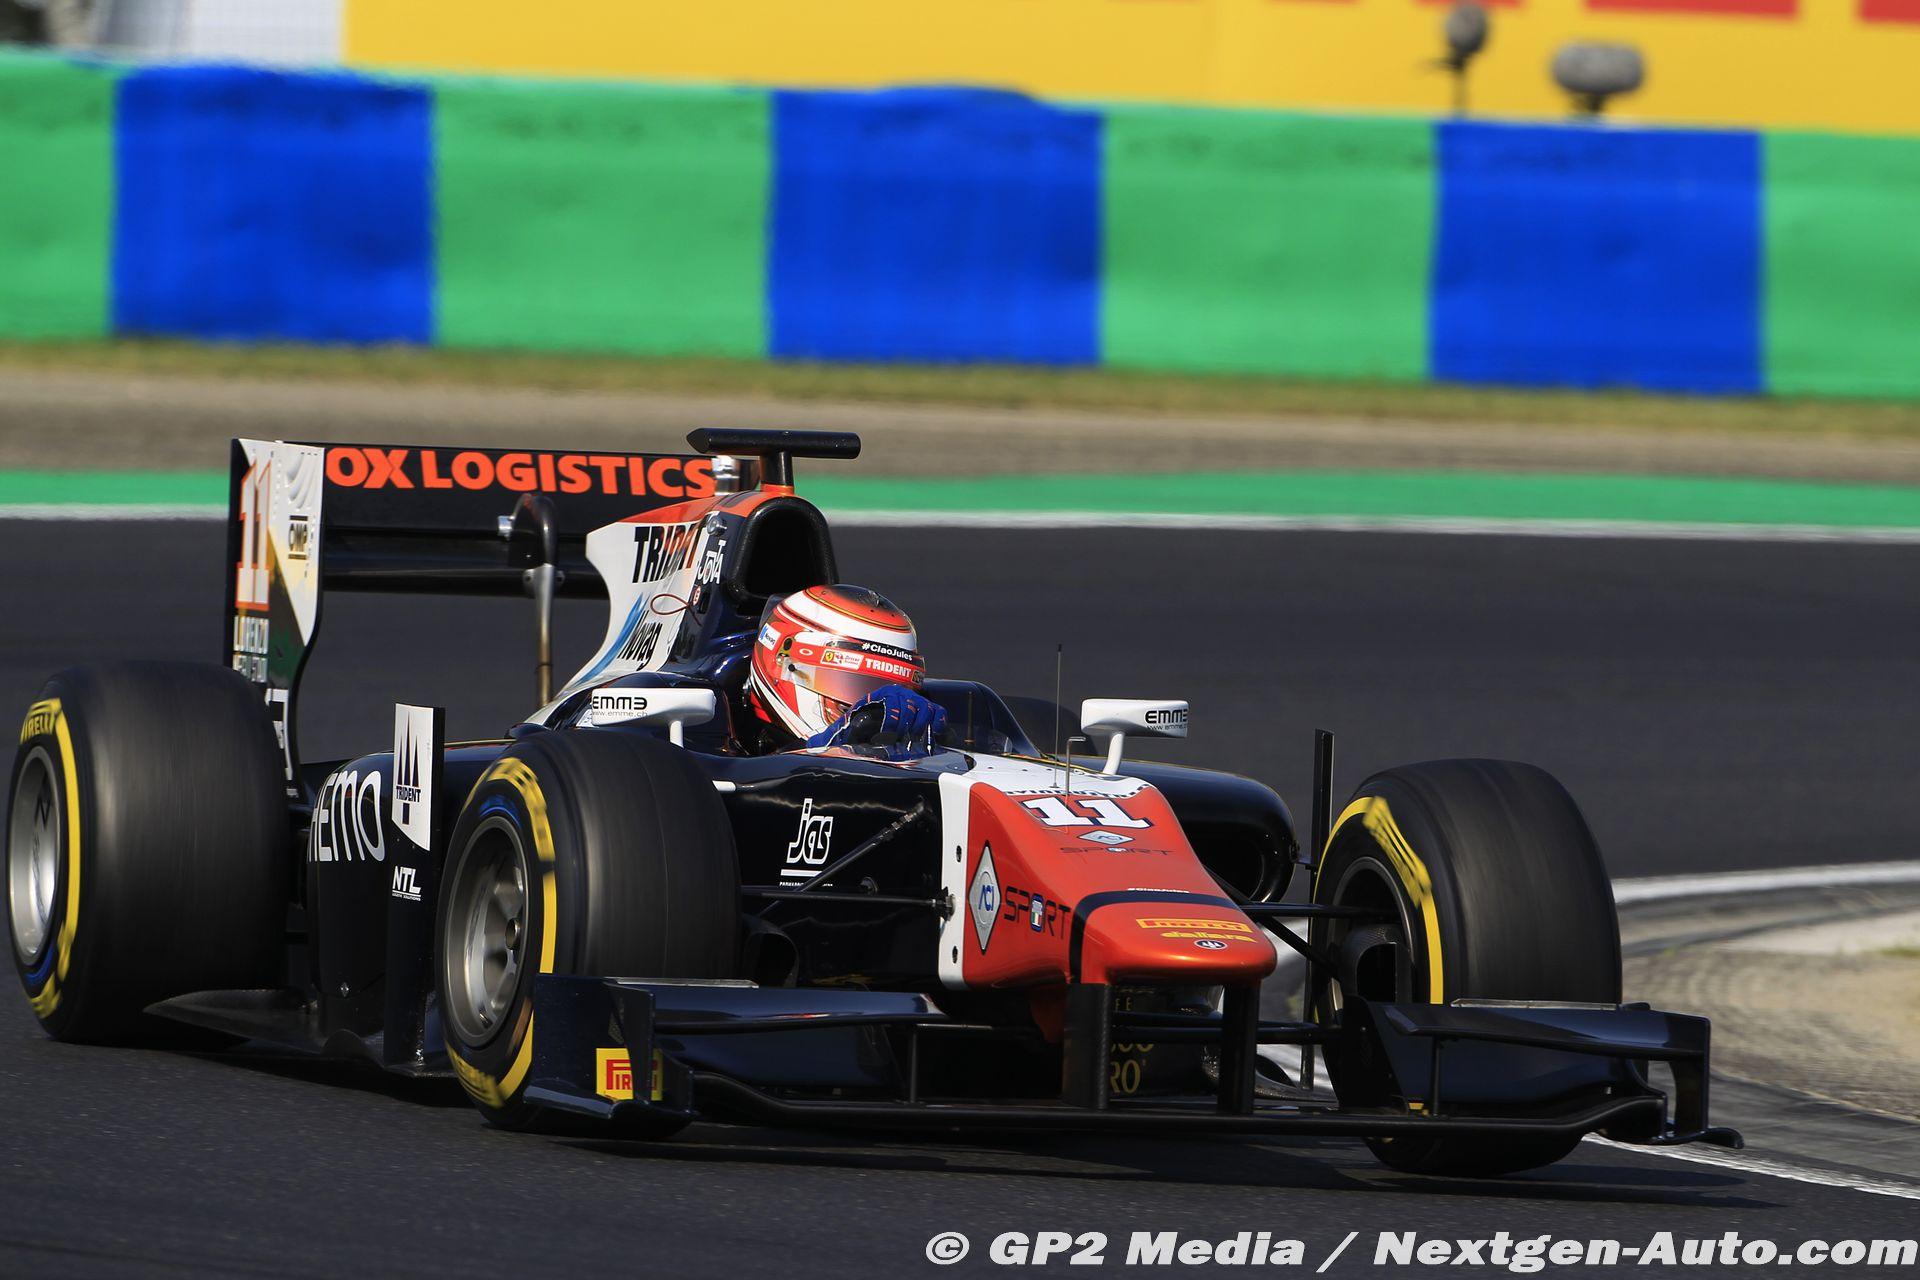 2015 GP2 Hongrie - Trident Racing - Raffaele Marciello